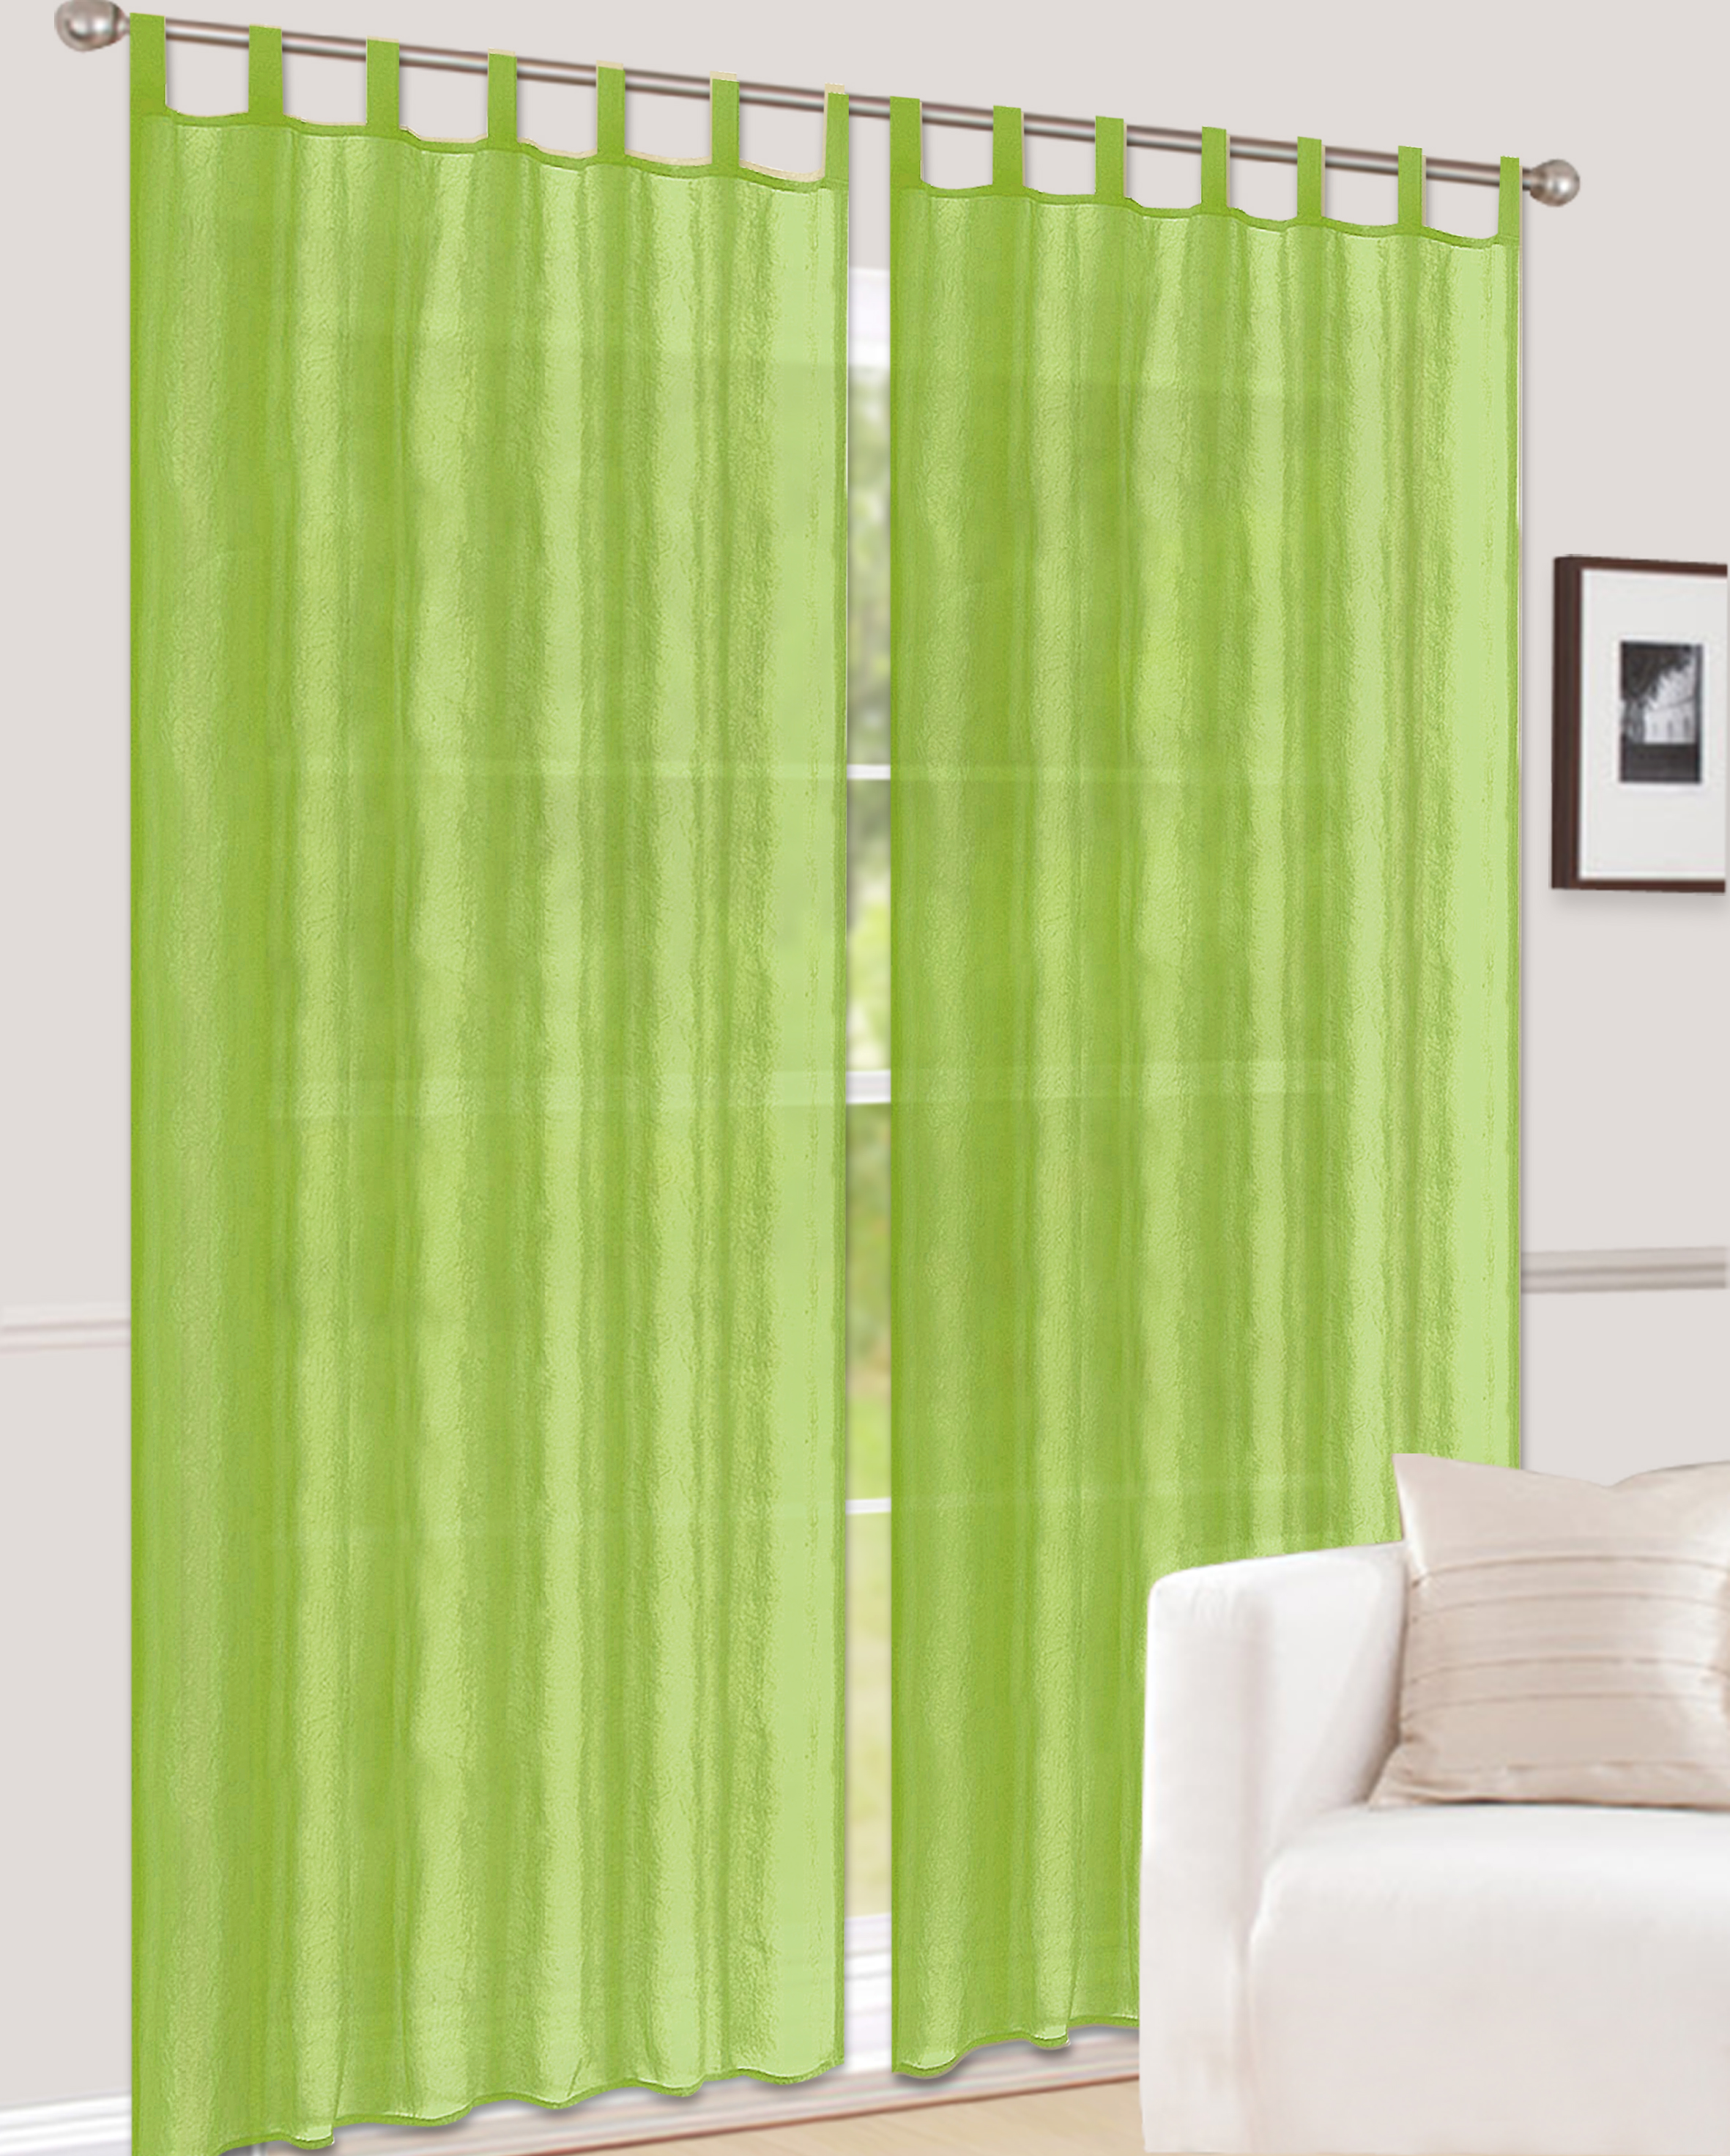 schlaufenschal gemustert halbtransparent gecrasht gr n silvestra sale bn gardinen online shop. Black Bedroom Furniture Sets. Home Design Ideas